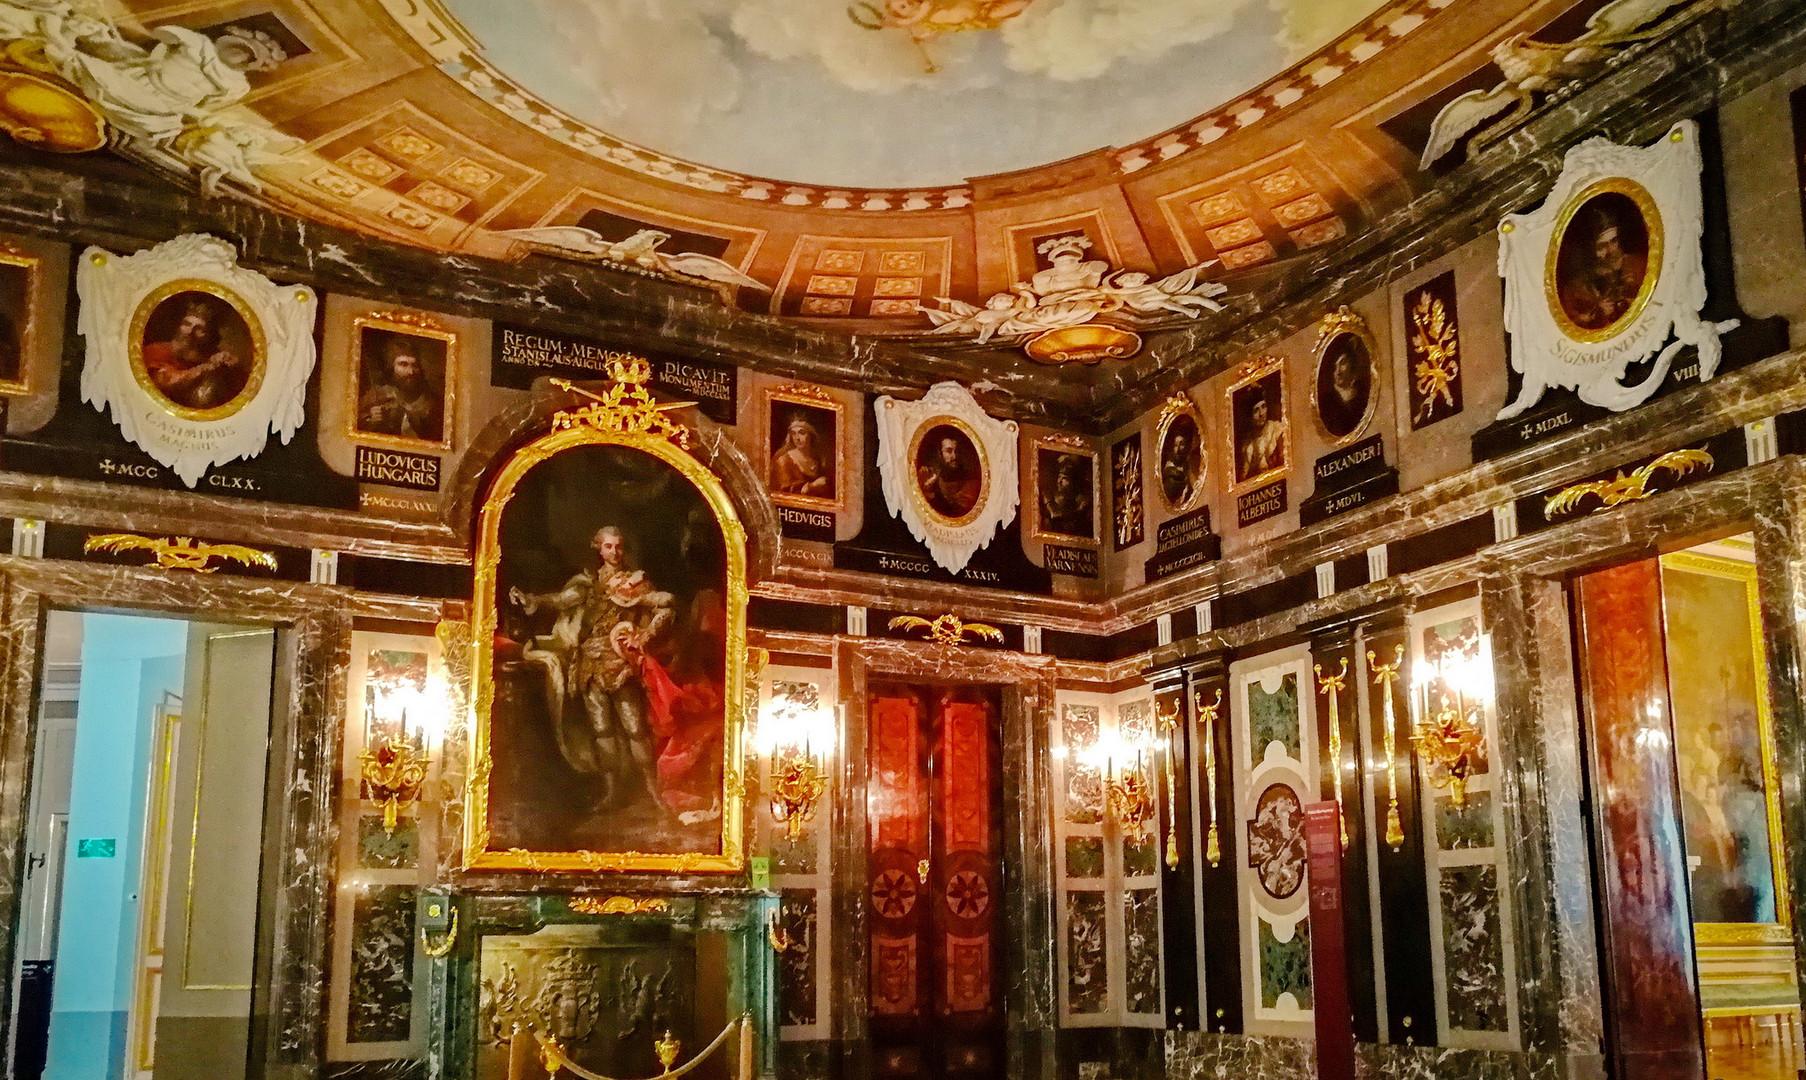 Королевский дворец в Варшаве